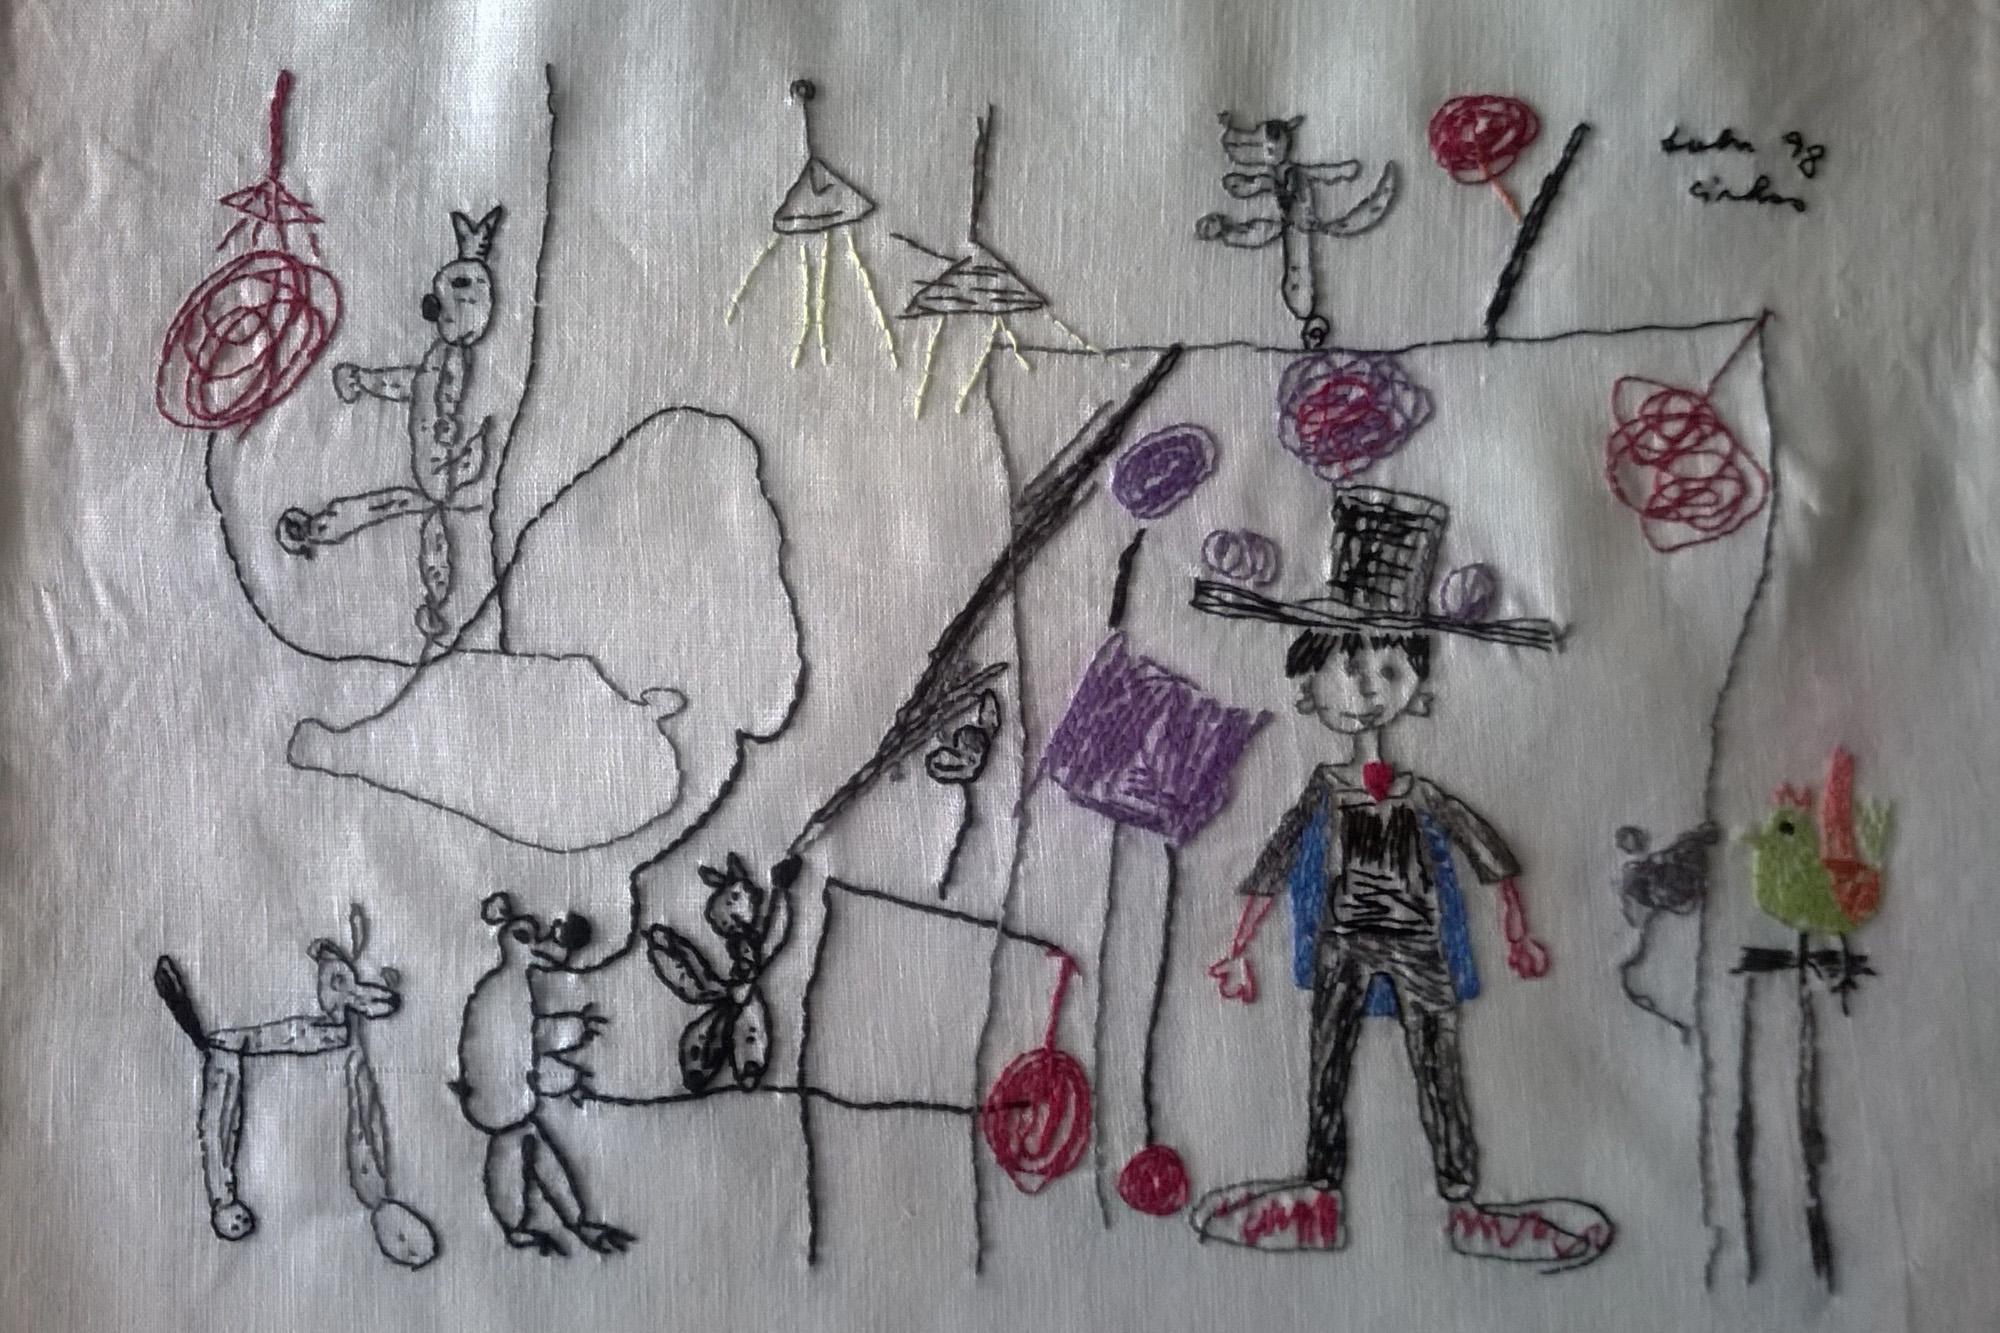 Posledni Workshop Na Tema Detska Kresba Praha 23 5 Brno 27 6